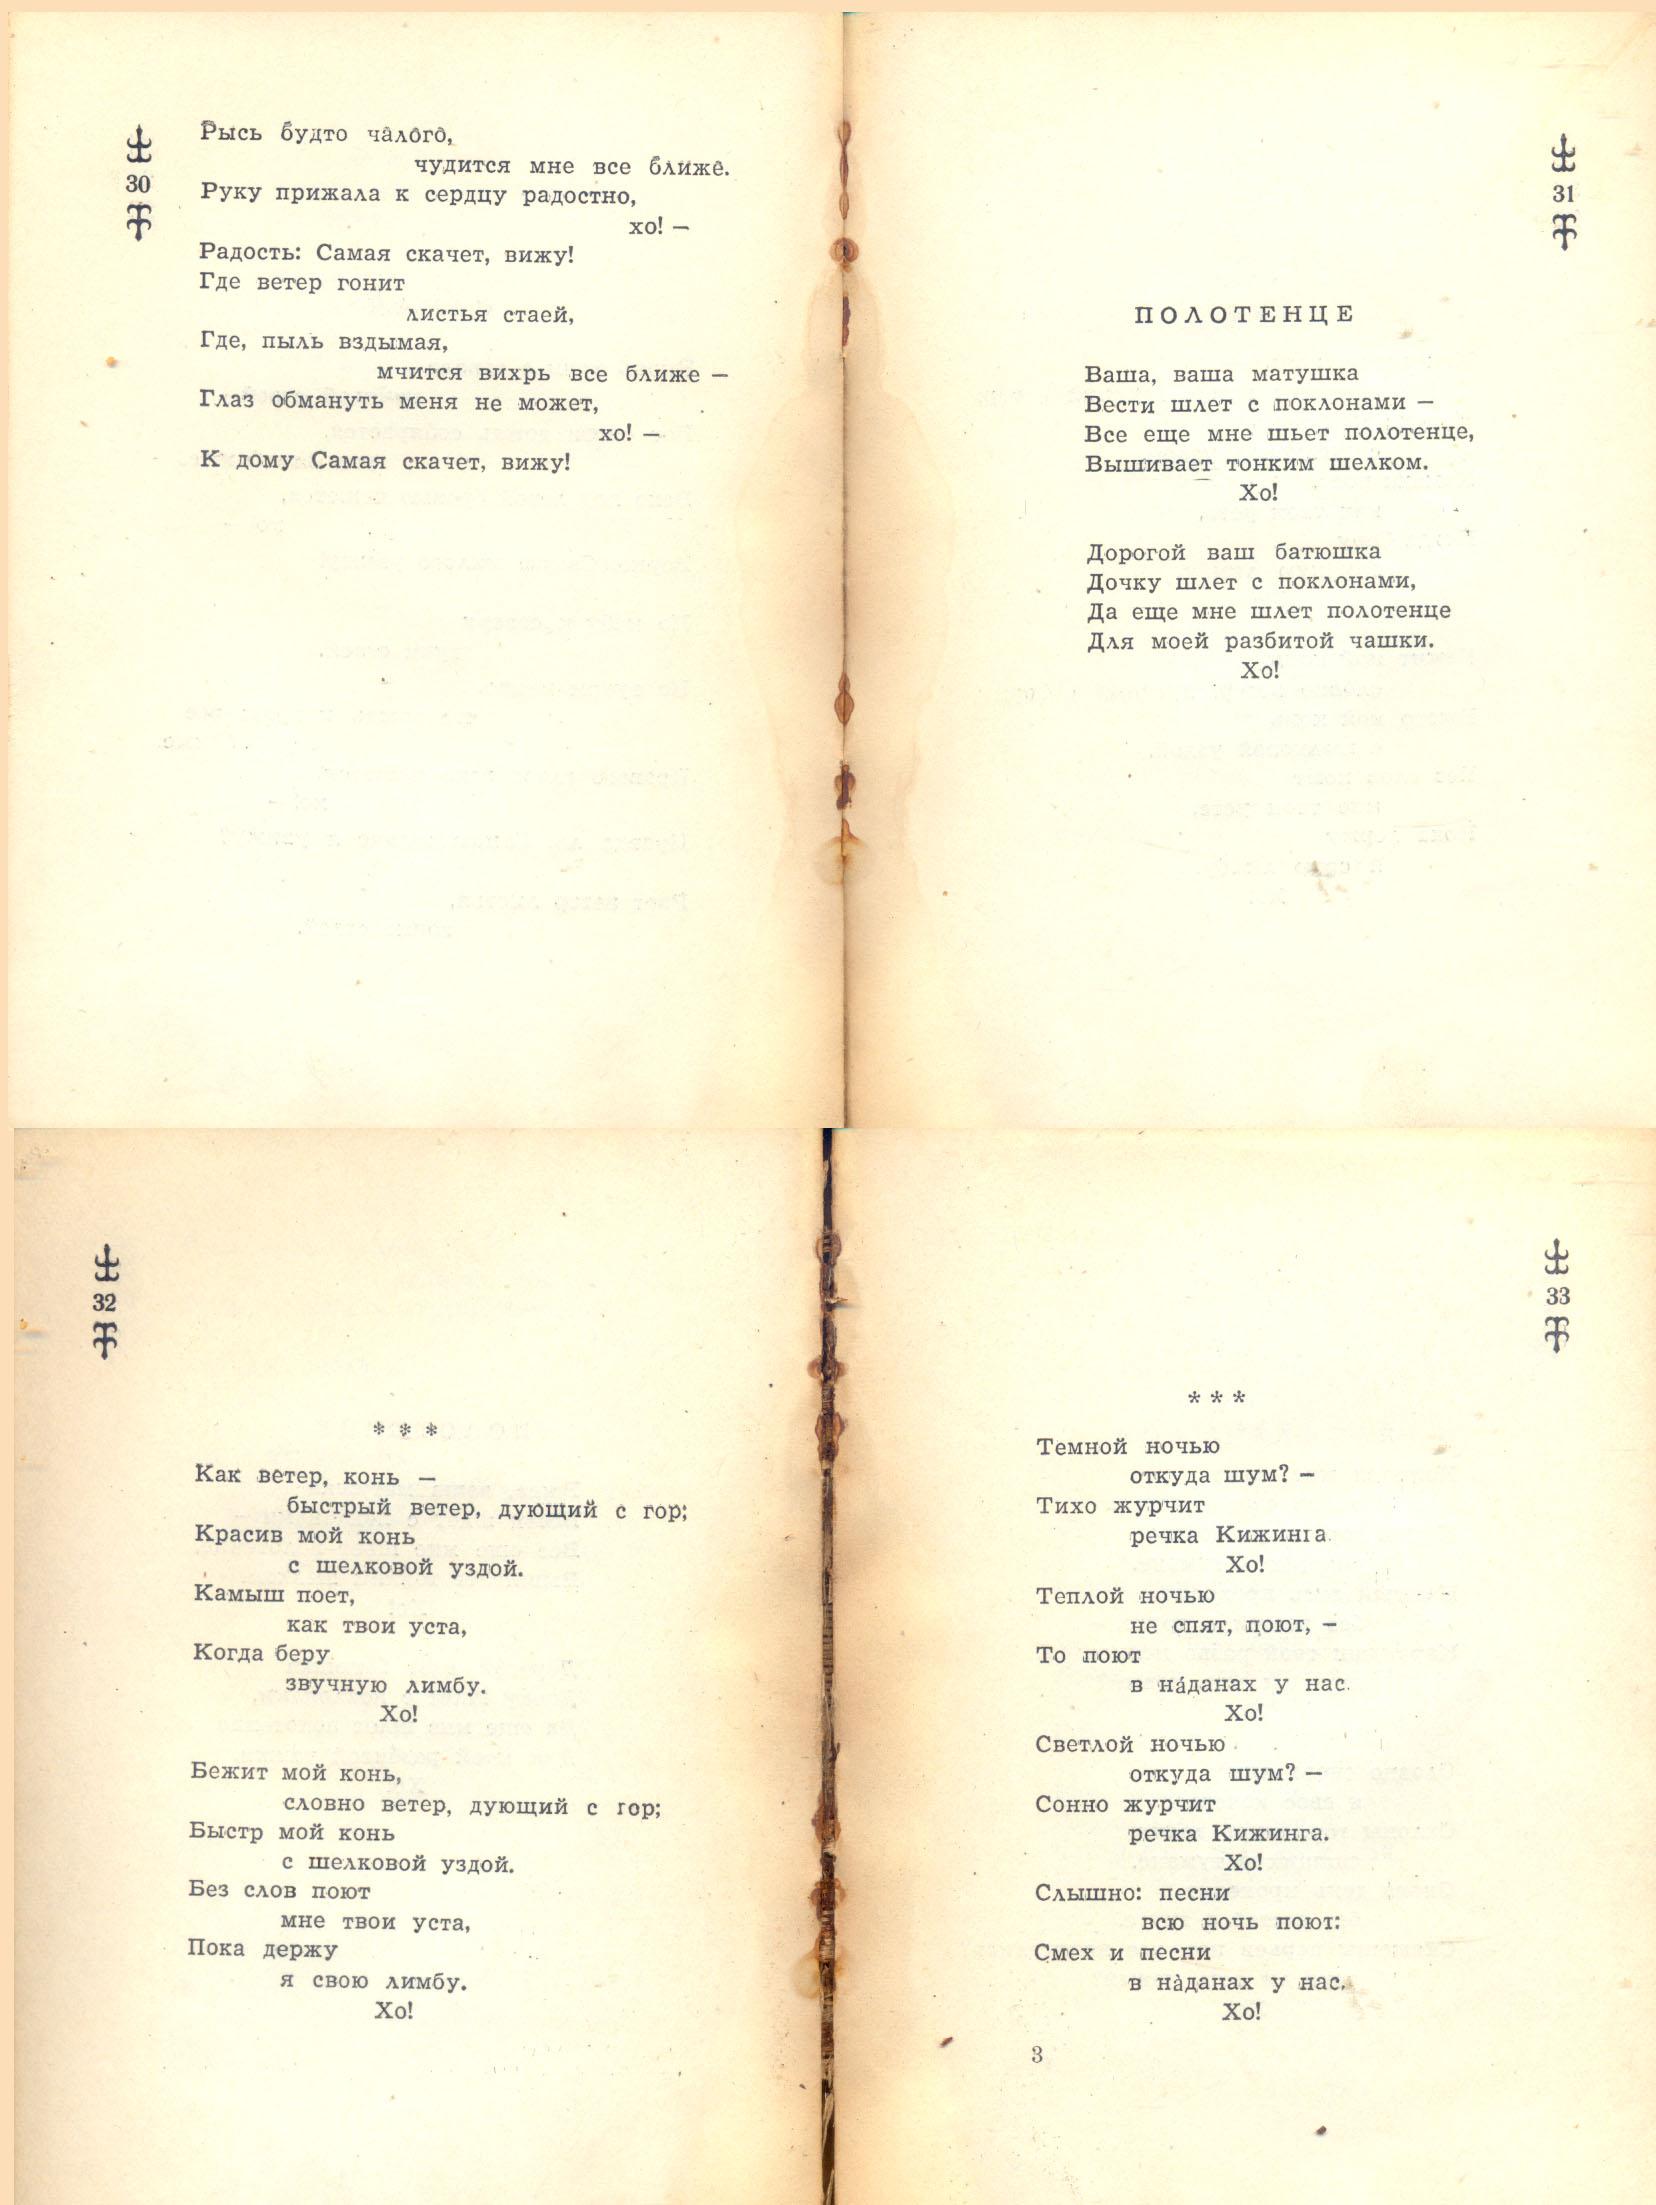 Песни 30-33.jpg